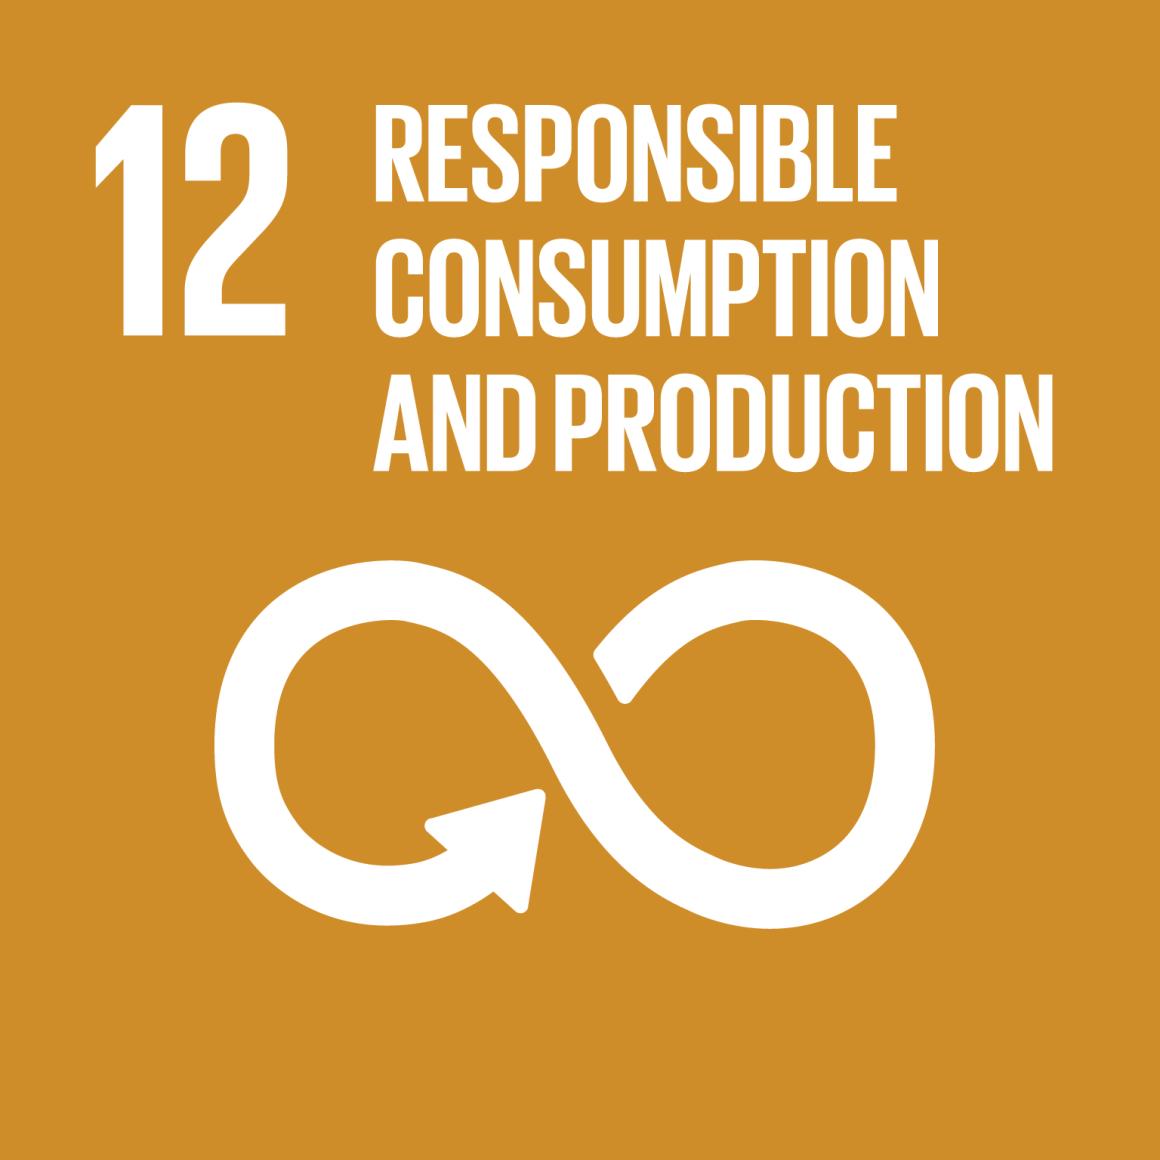 E_SDG-goals_Goal-12.png